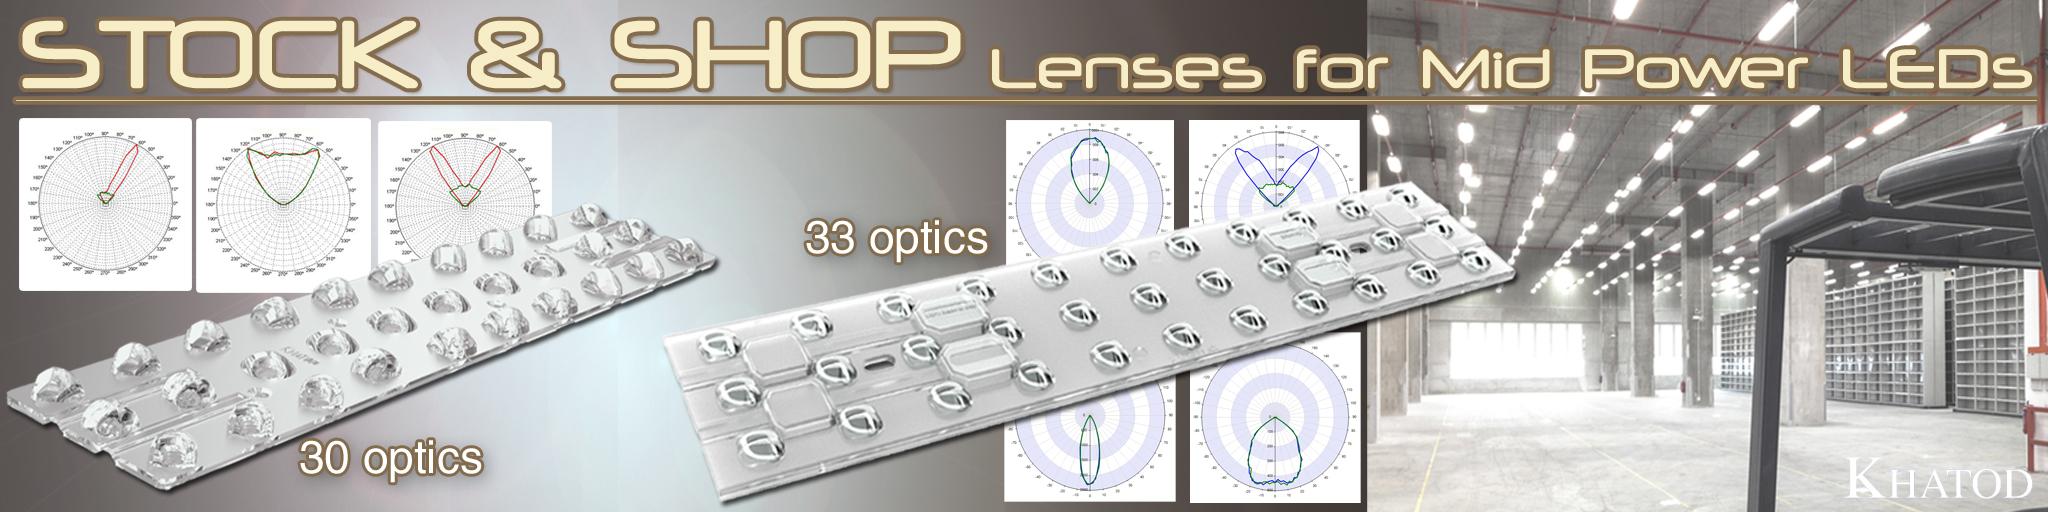 Sistemas ópticos Stock and Shop para LED de potencia media